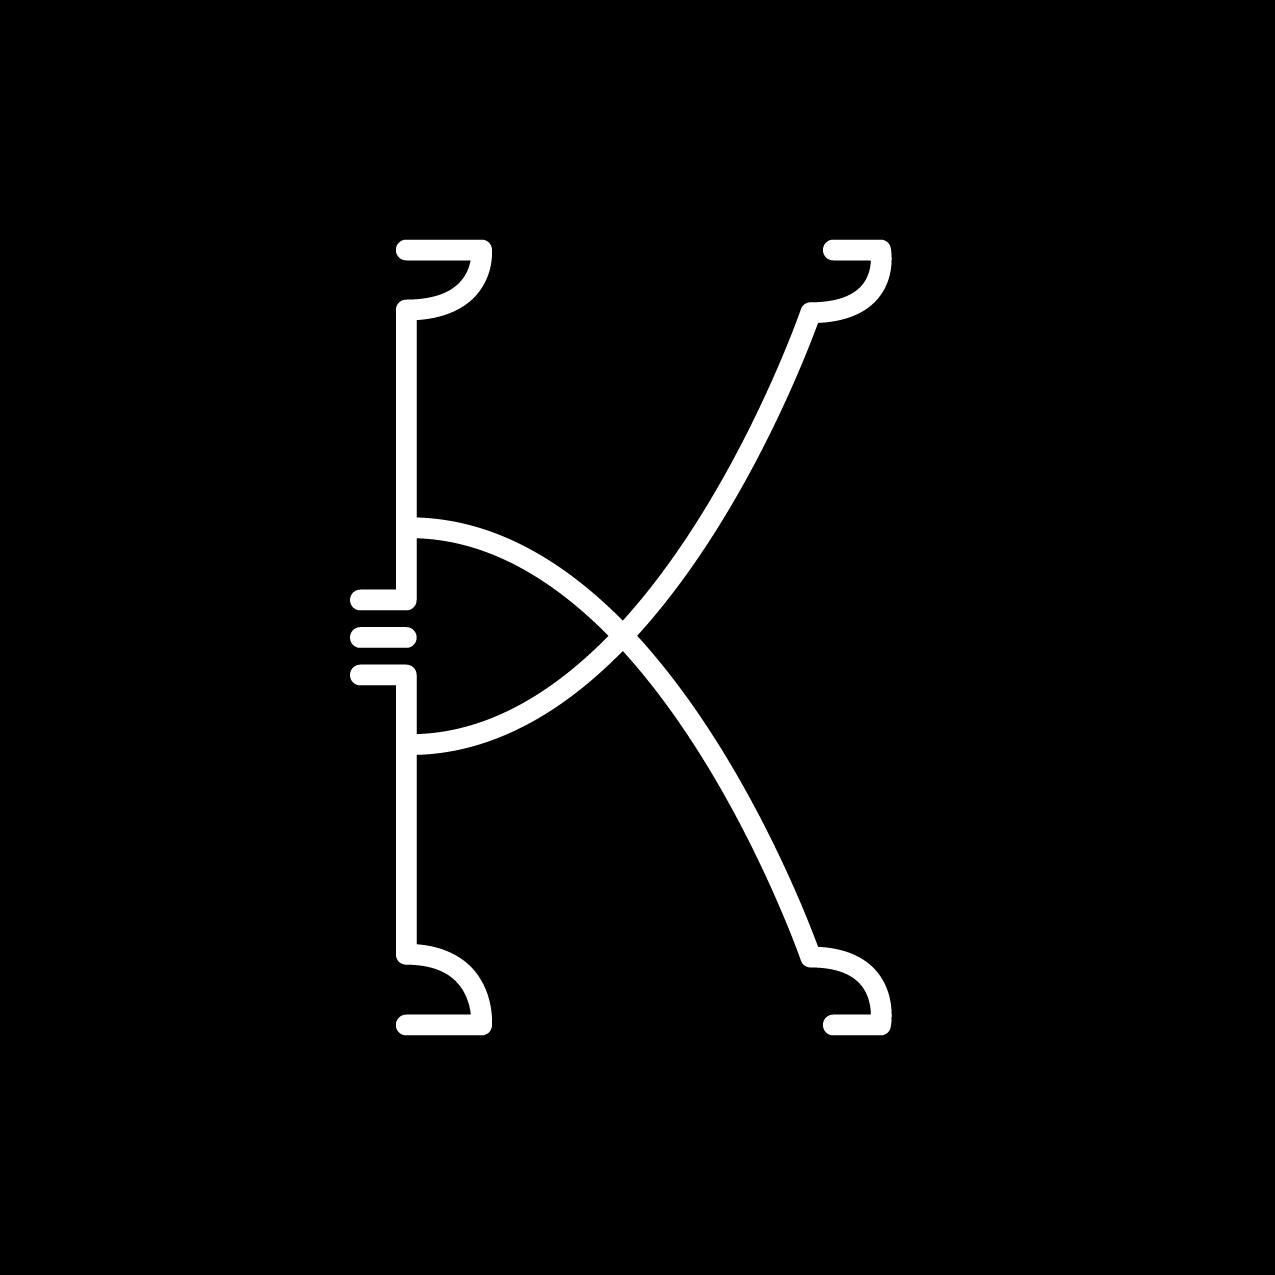 Letter K4 Design by Furia